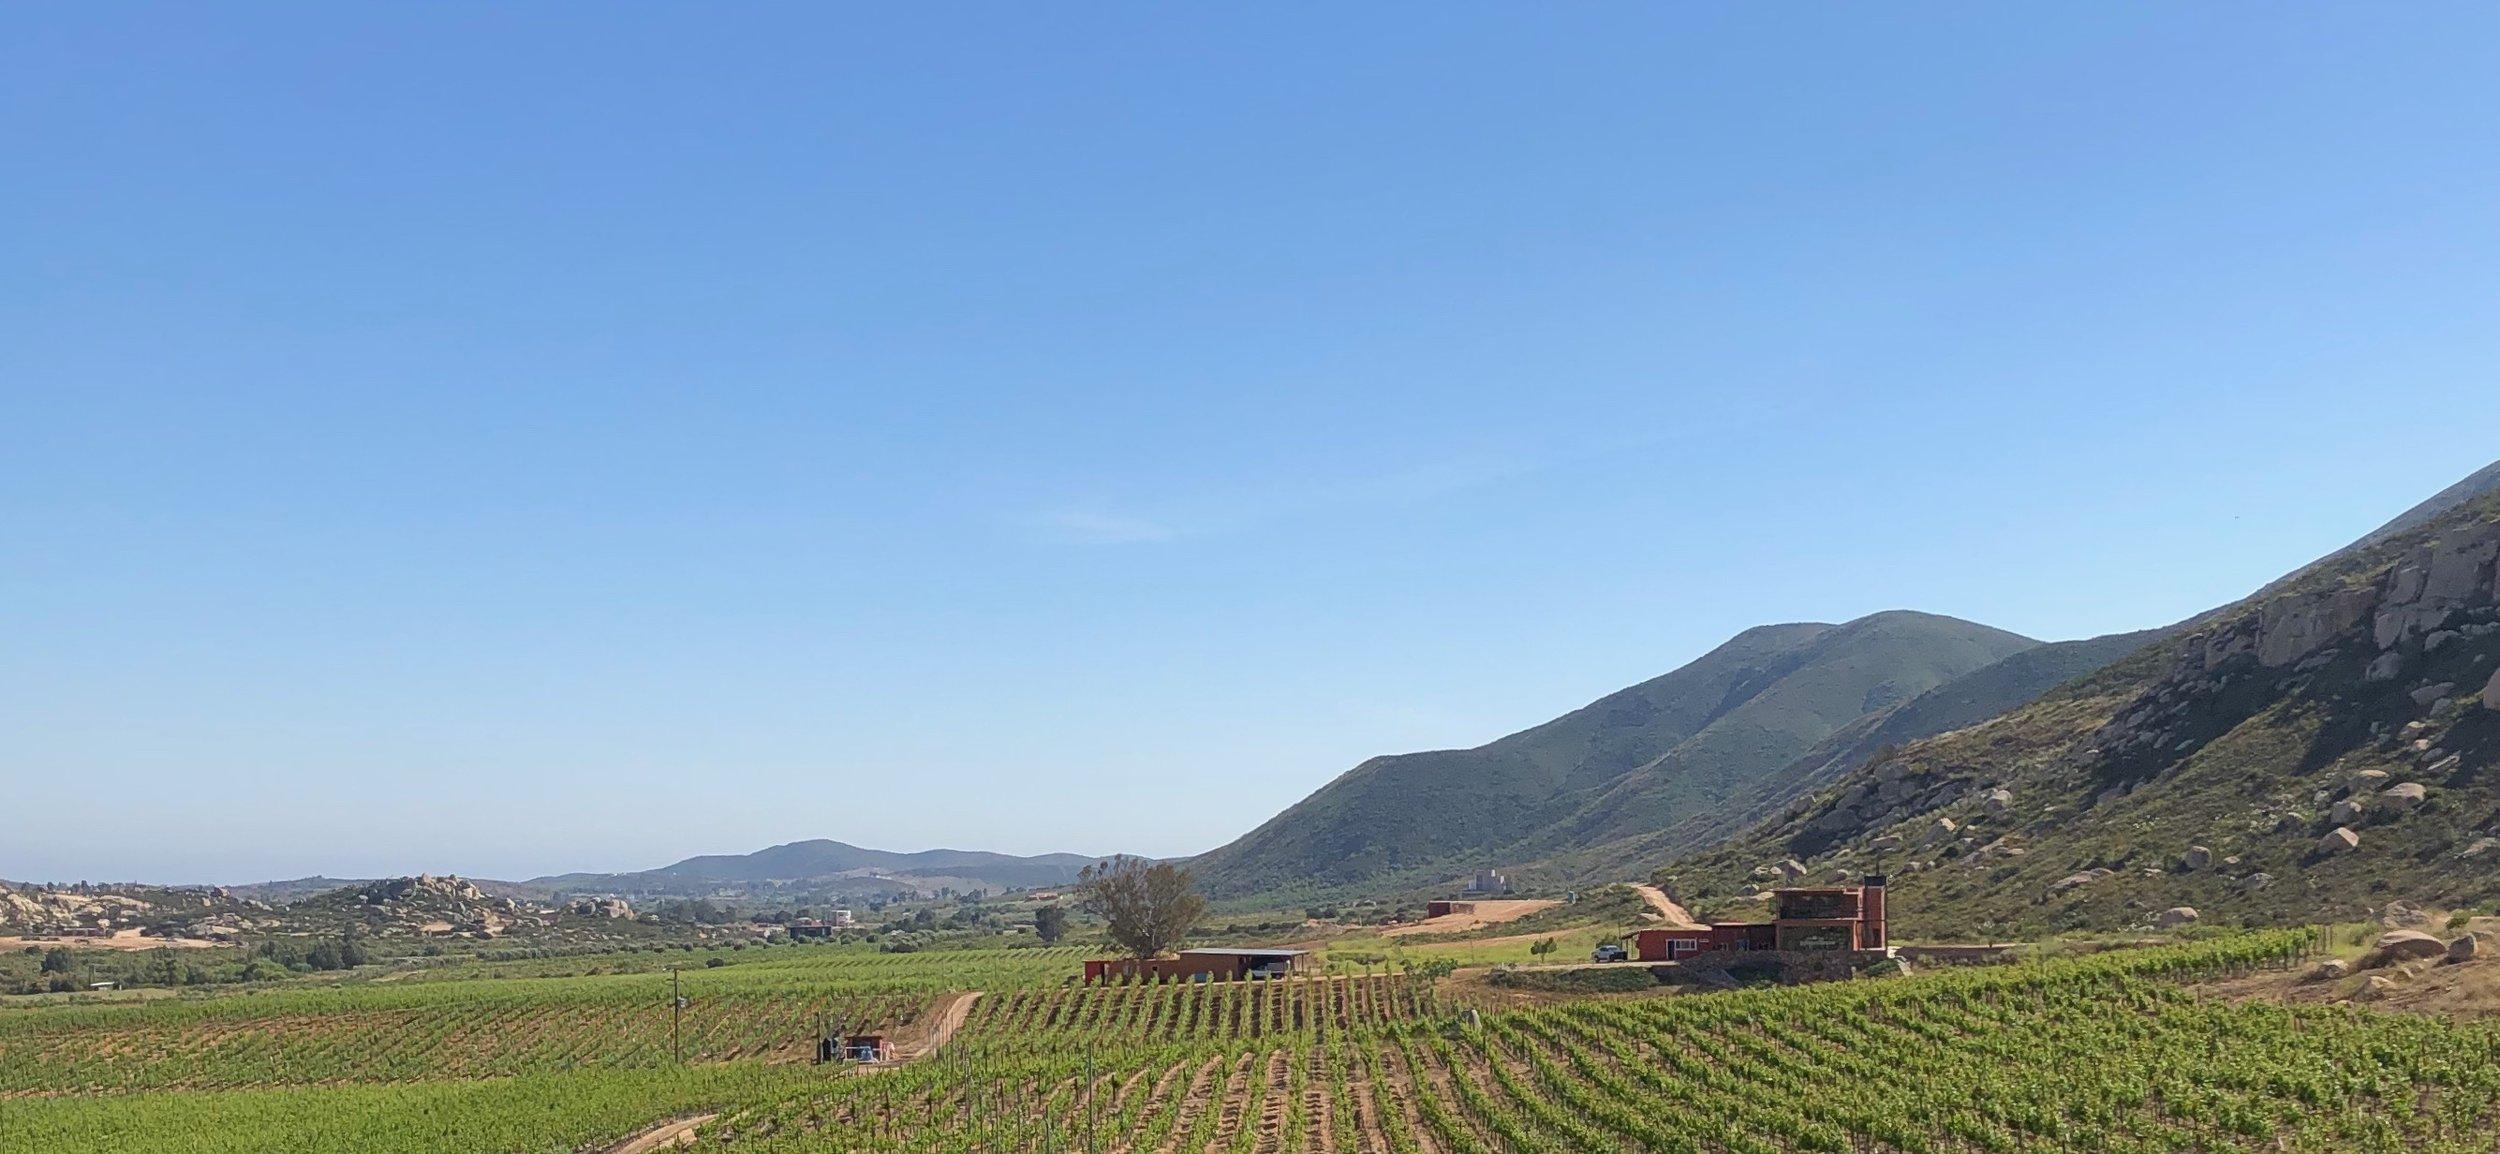 Villa Montefiori